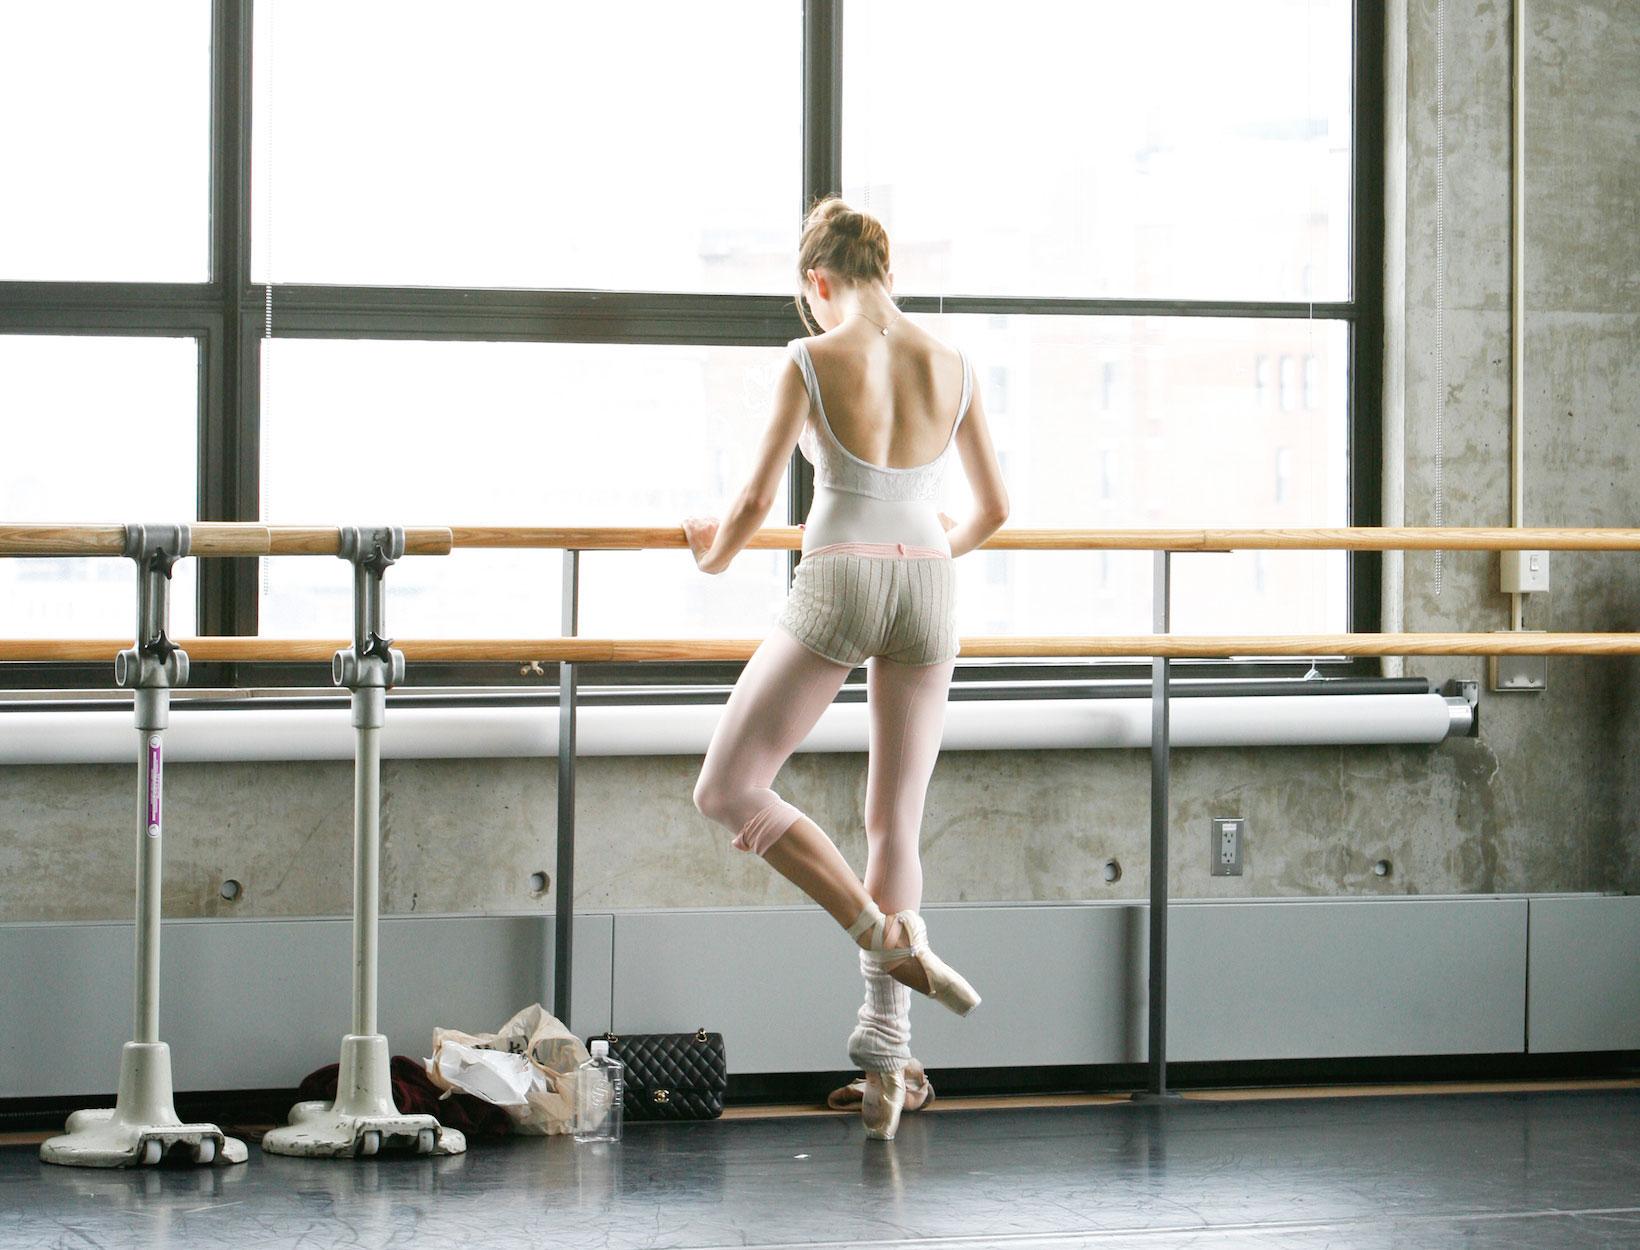 XXX Isabella Boylston nudes (48 photo), Ass, Fappening, Feet, braless 2020